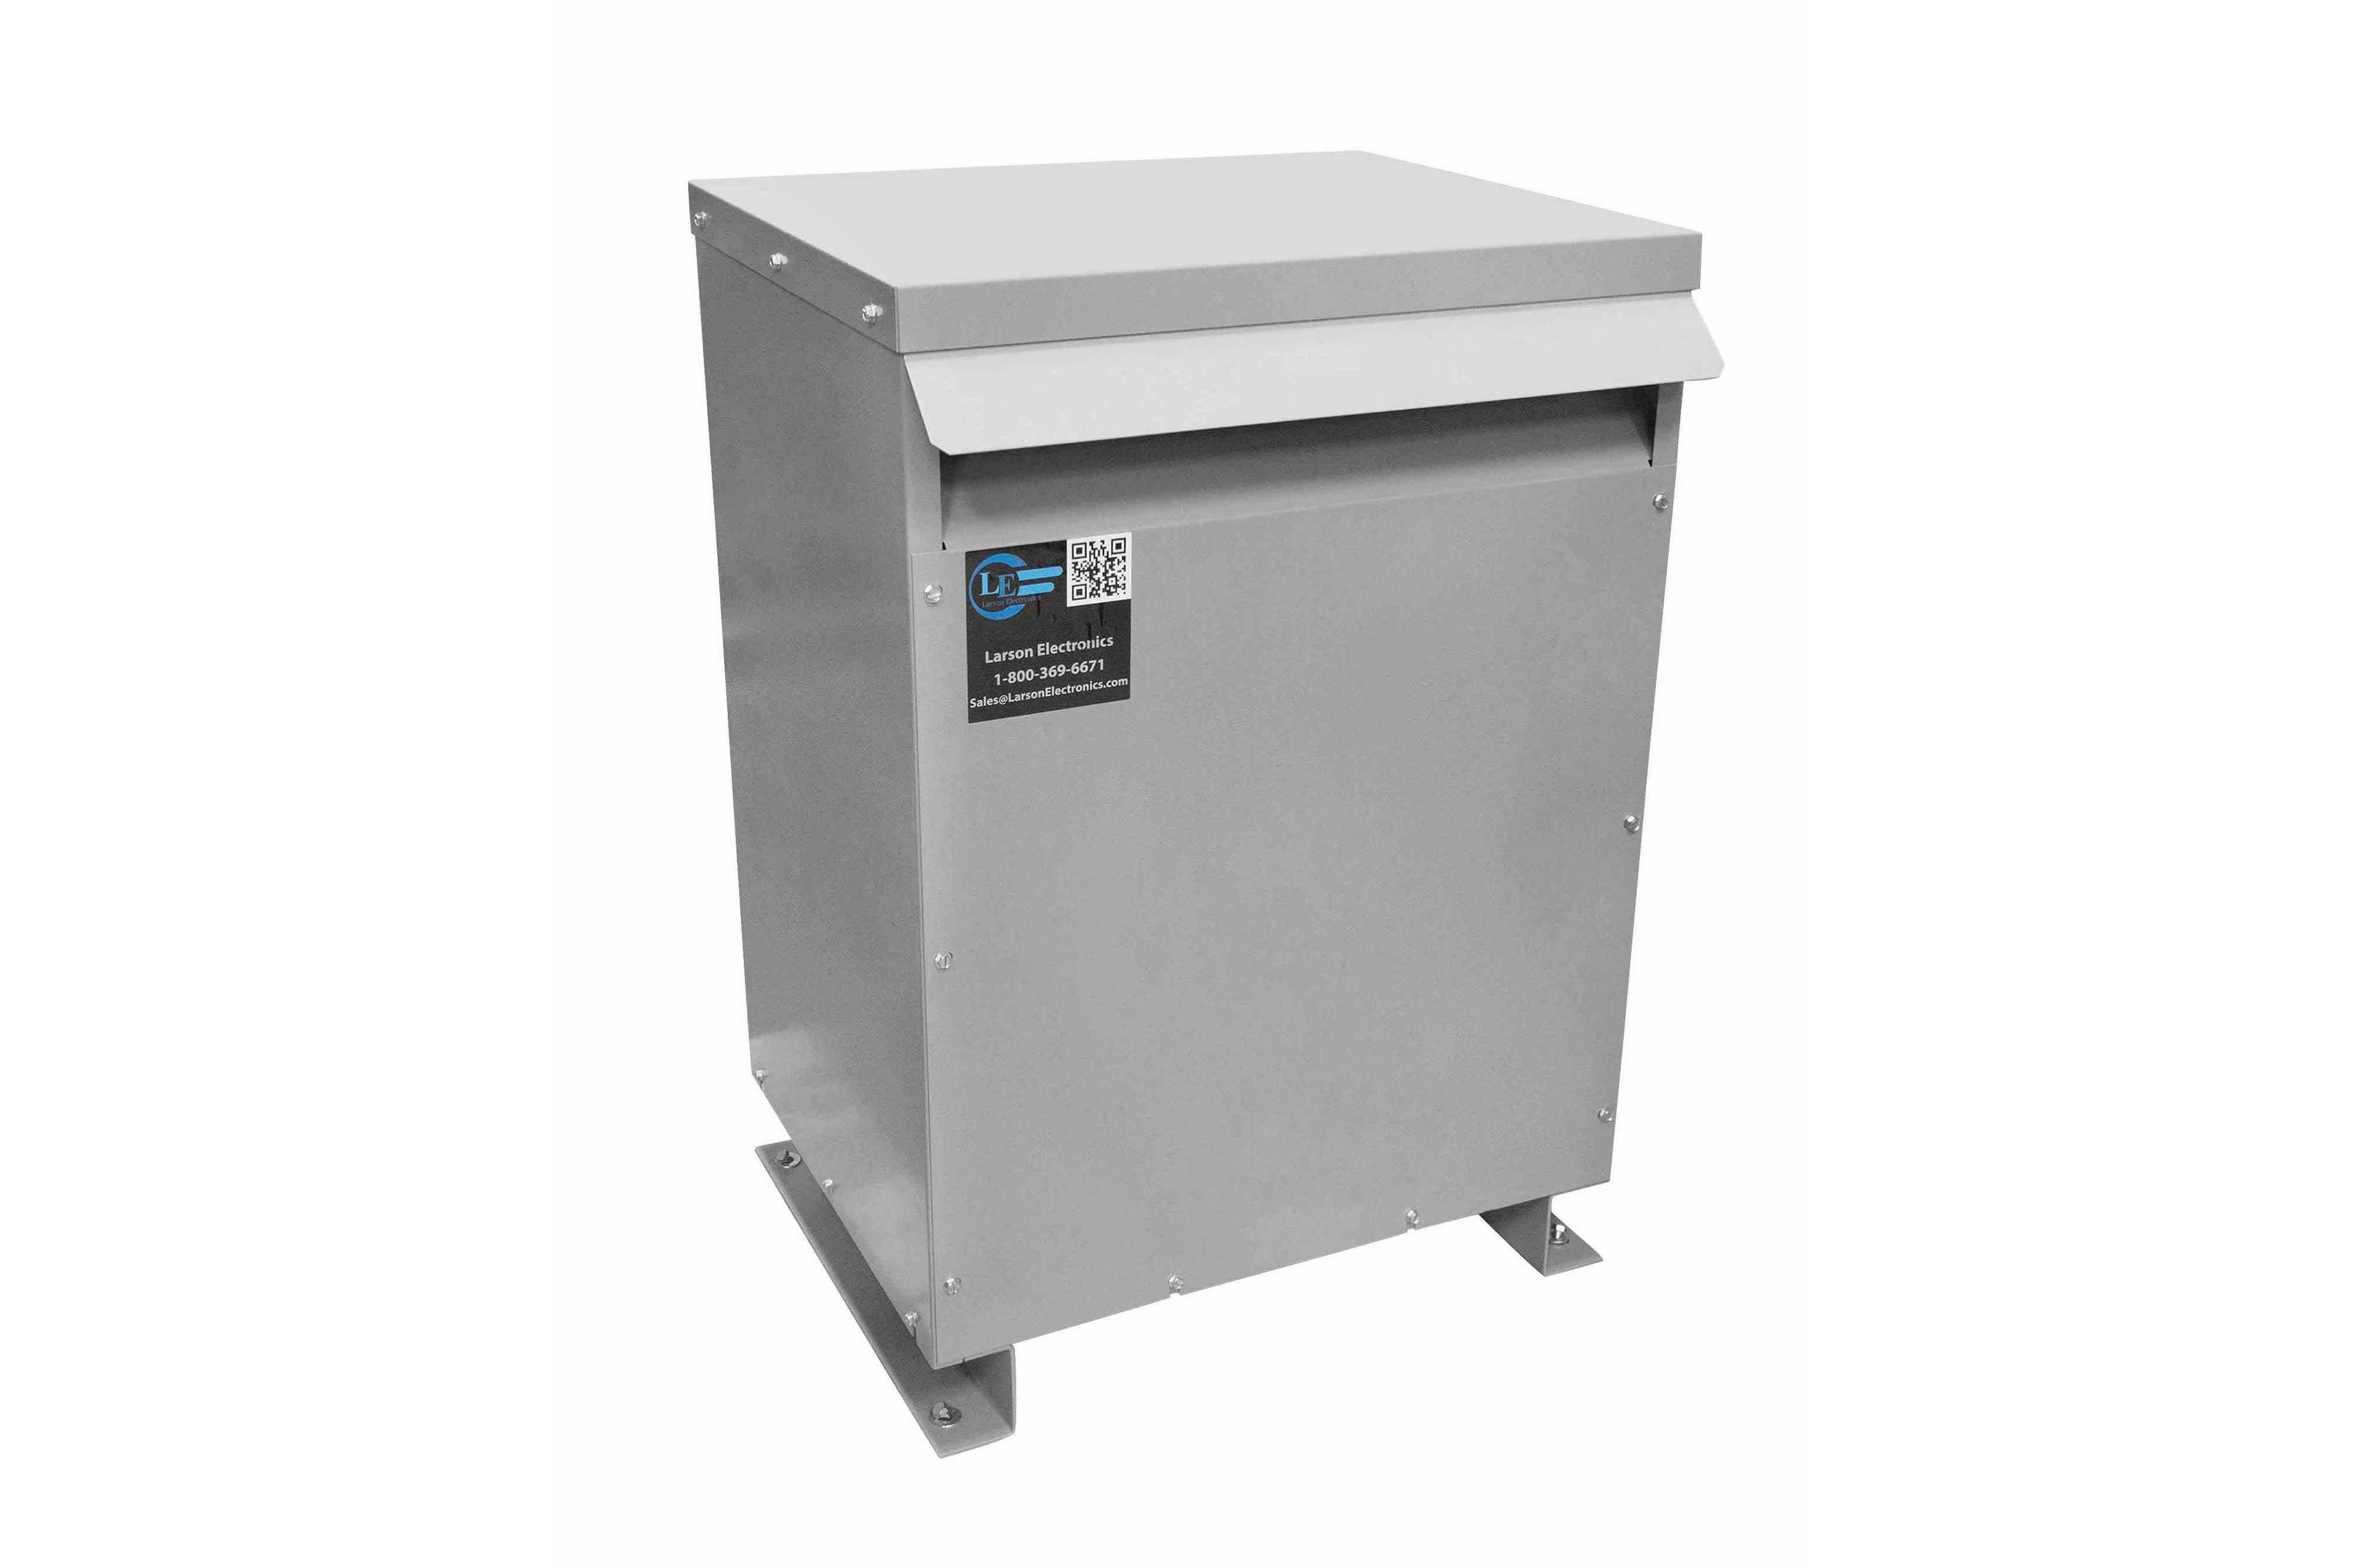 35 kVA 3PH Isolation Transformer, 575V Wye Primary, 480Y/277 Wye-N Secondary, N3R, Ventilated, 60 Hz